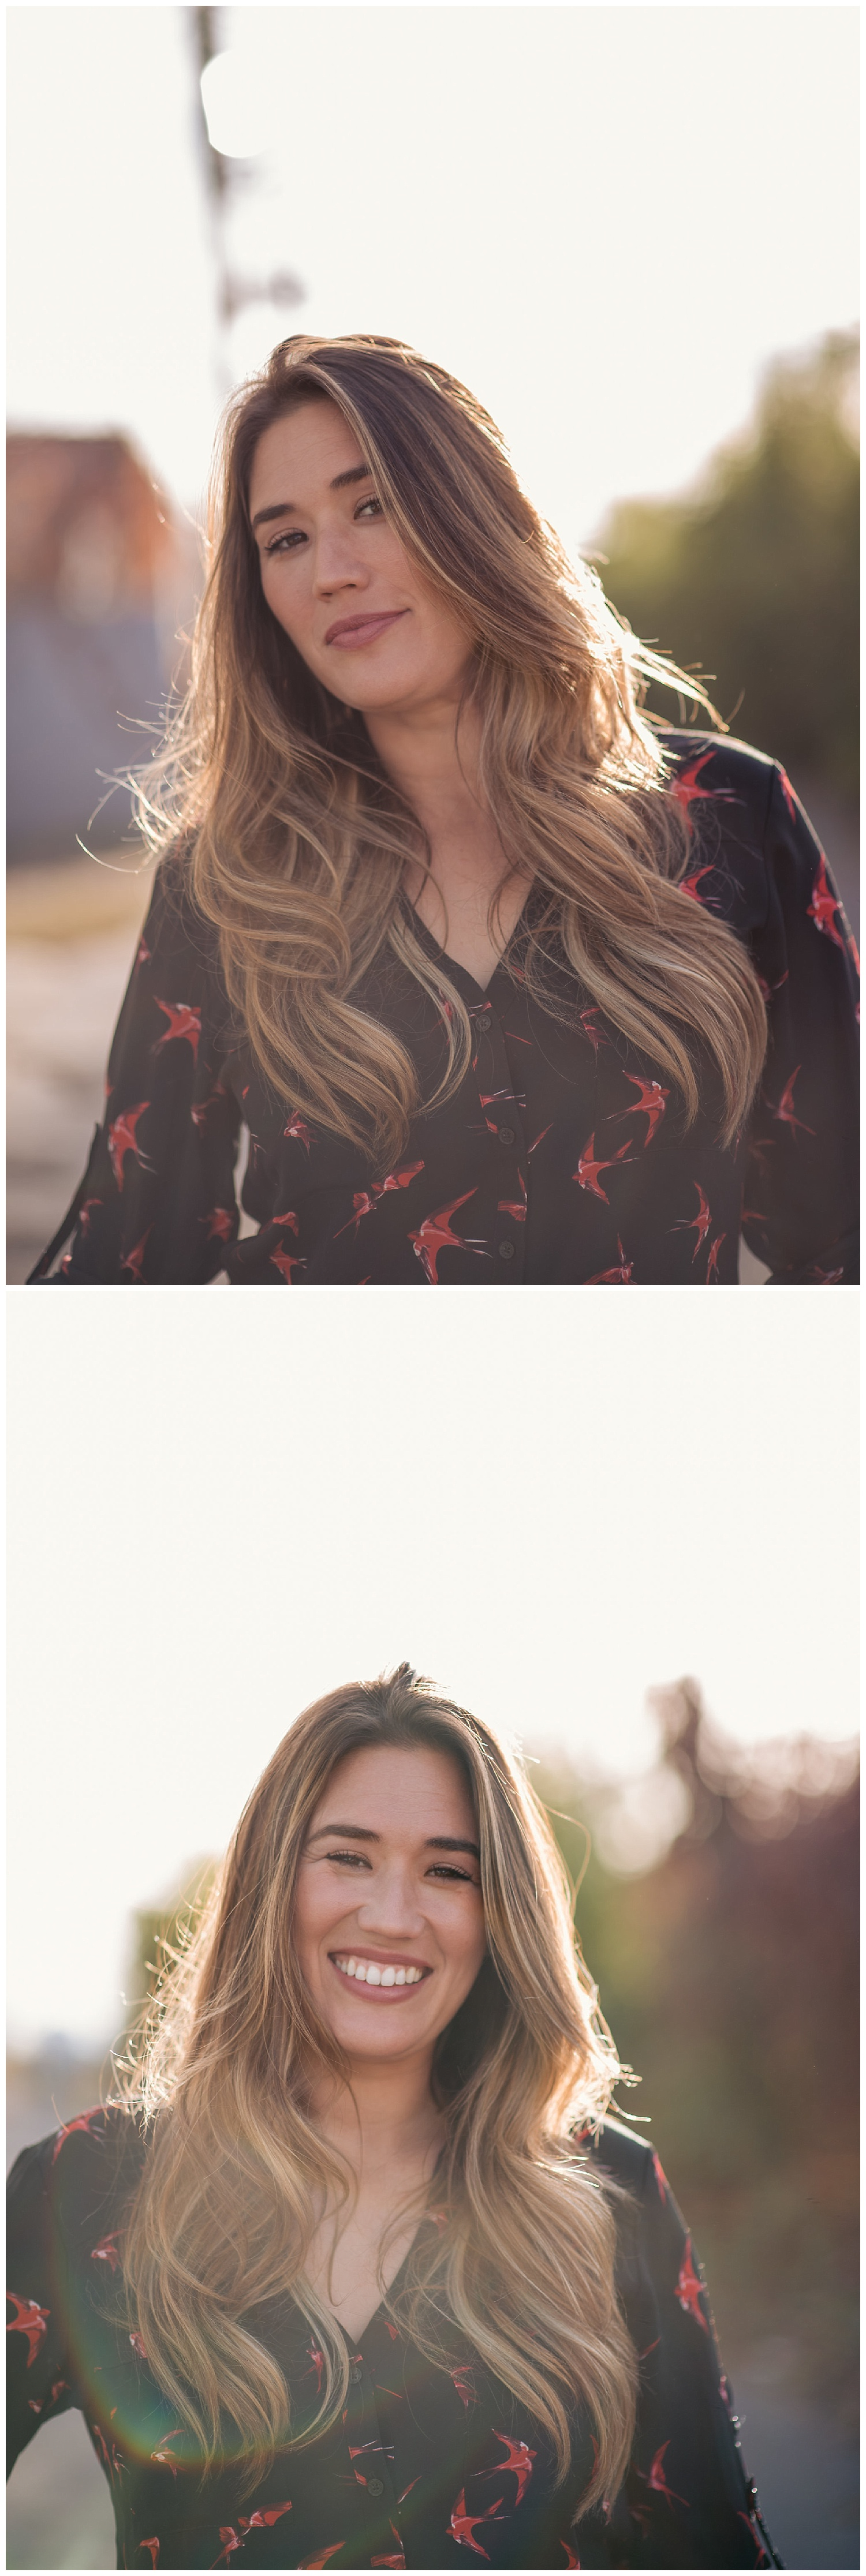 RINO headshots, downtown denver headshots, colorado headshot photographer, denver headshot photographer, denver corporate photographer, colorado corporate photographer, rino denver photography, female branding denver, brunette headshots, headshot posing, street photography denver, sunset headshots